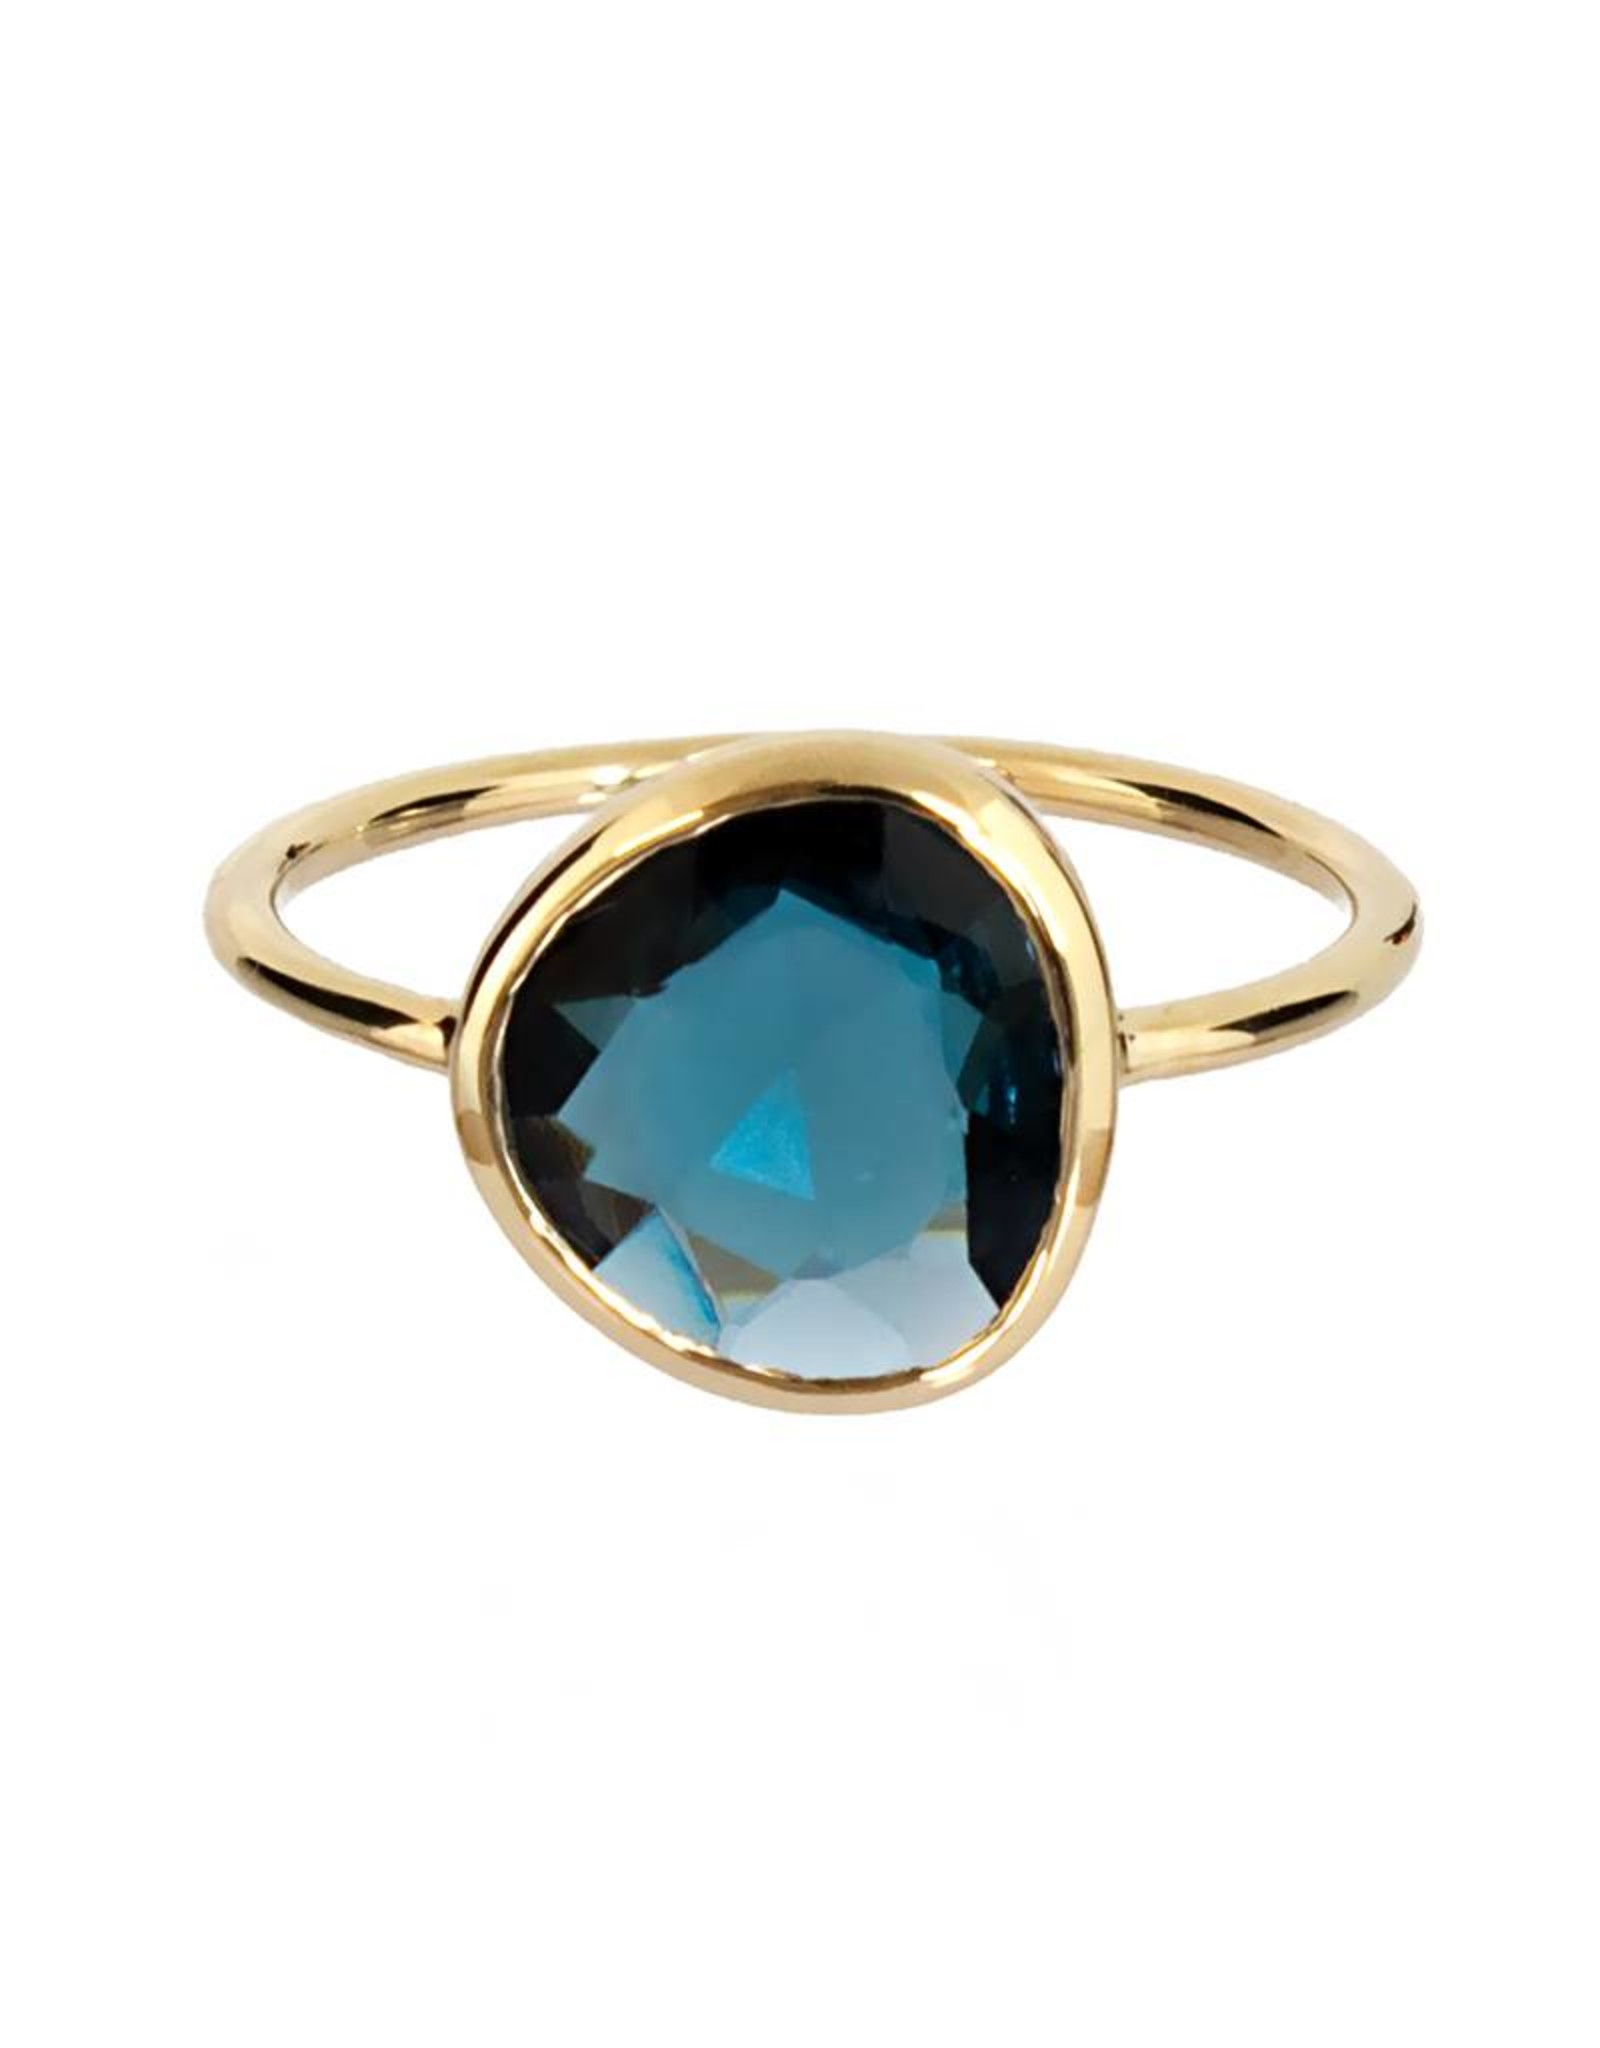 Bo Gold Ring - Goud - London blauw topaas